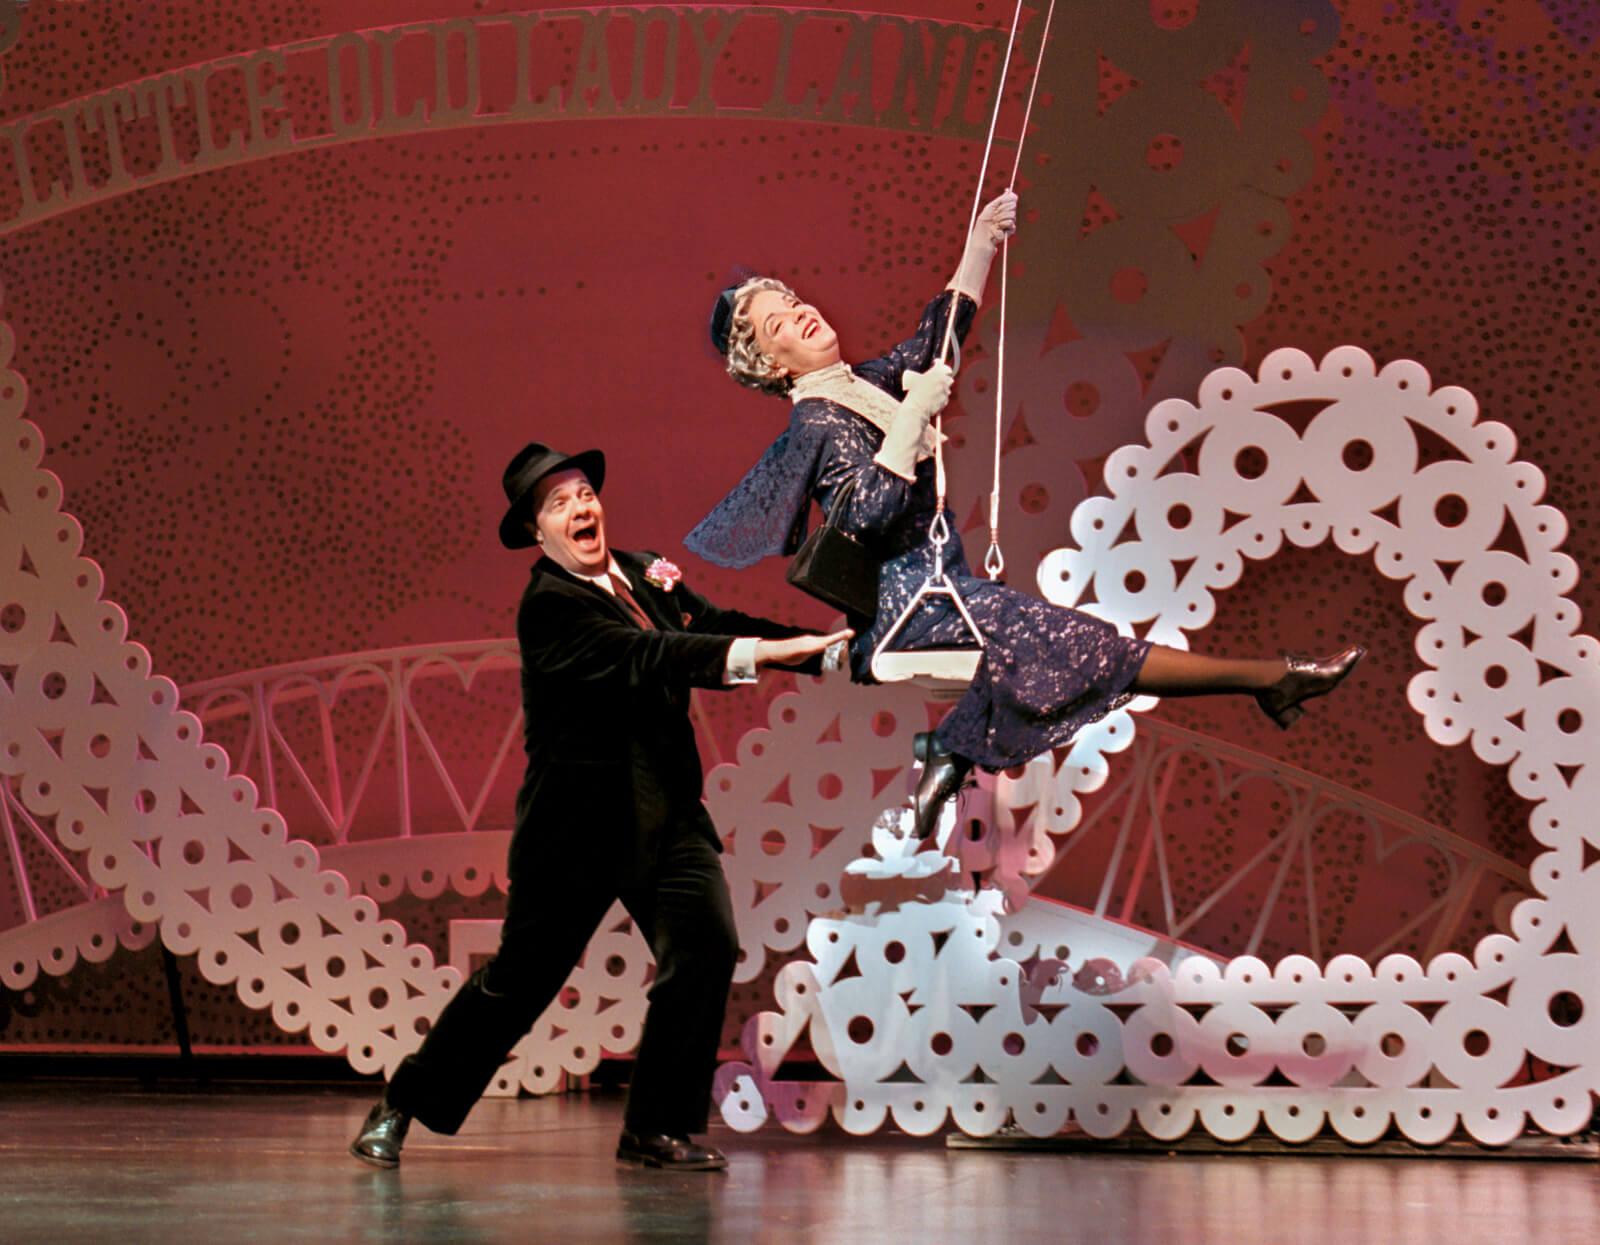 Max Bialystock (Nathan Lane) pushing Lick-me Bite-me (Jennifer Smith) in a swing.